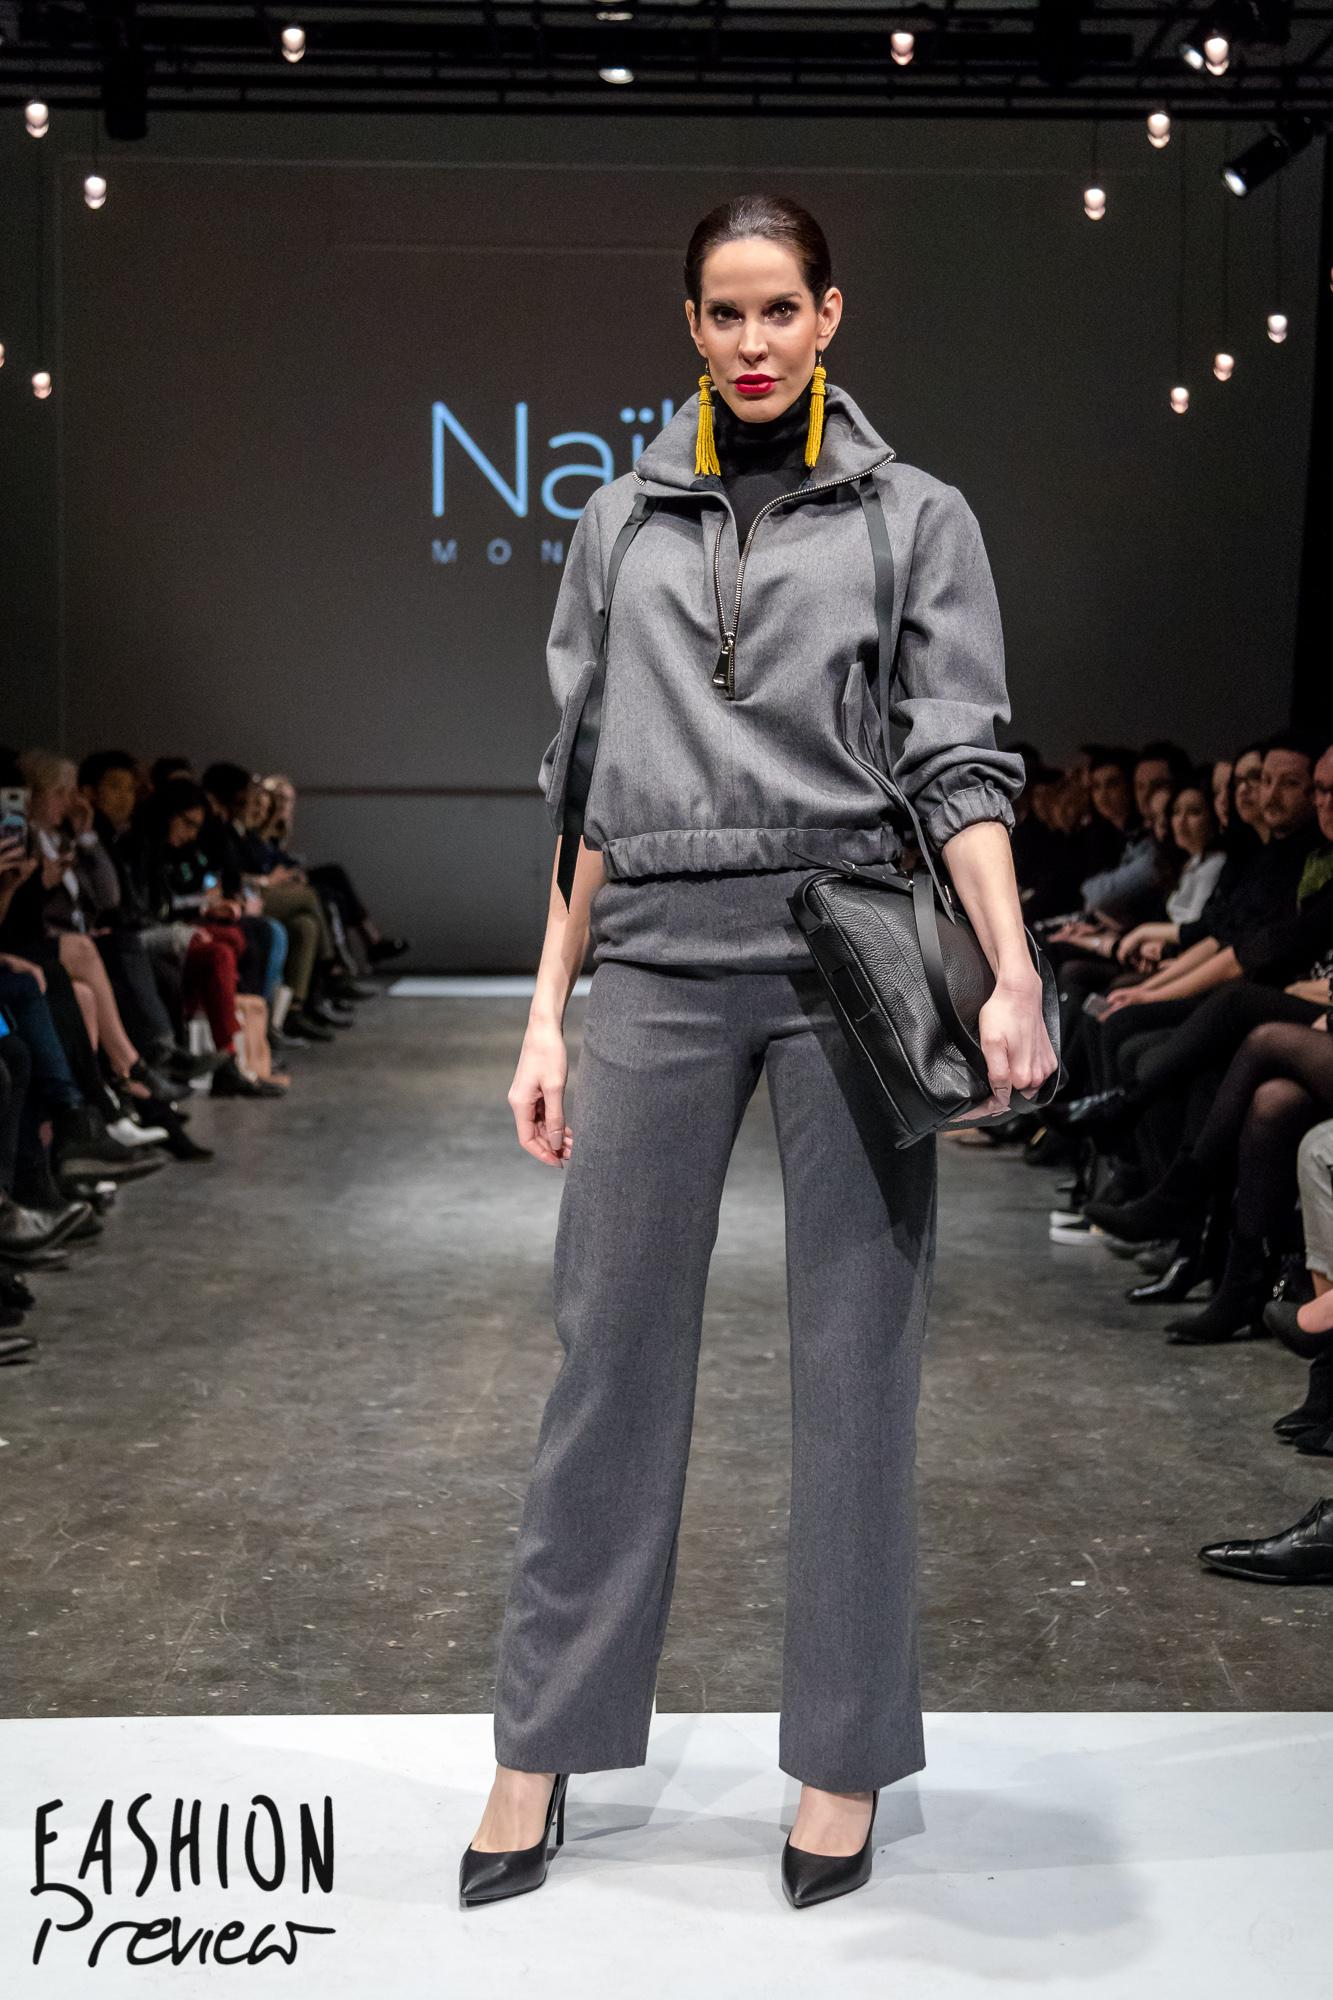 Fashion Preview 9 - Naike-11.jpg